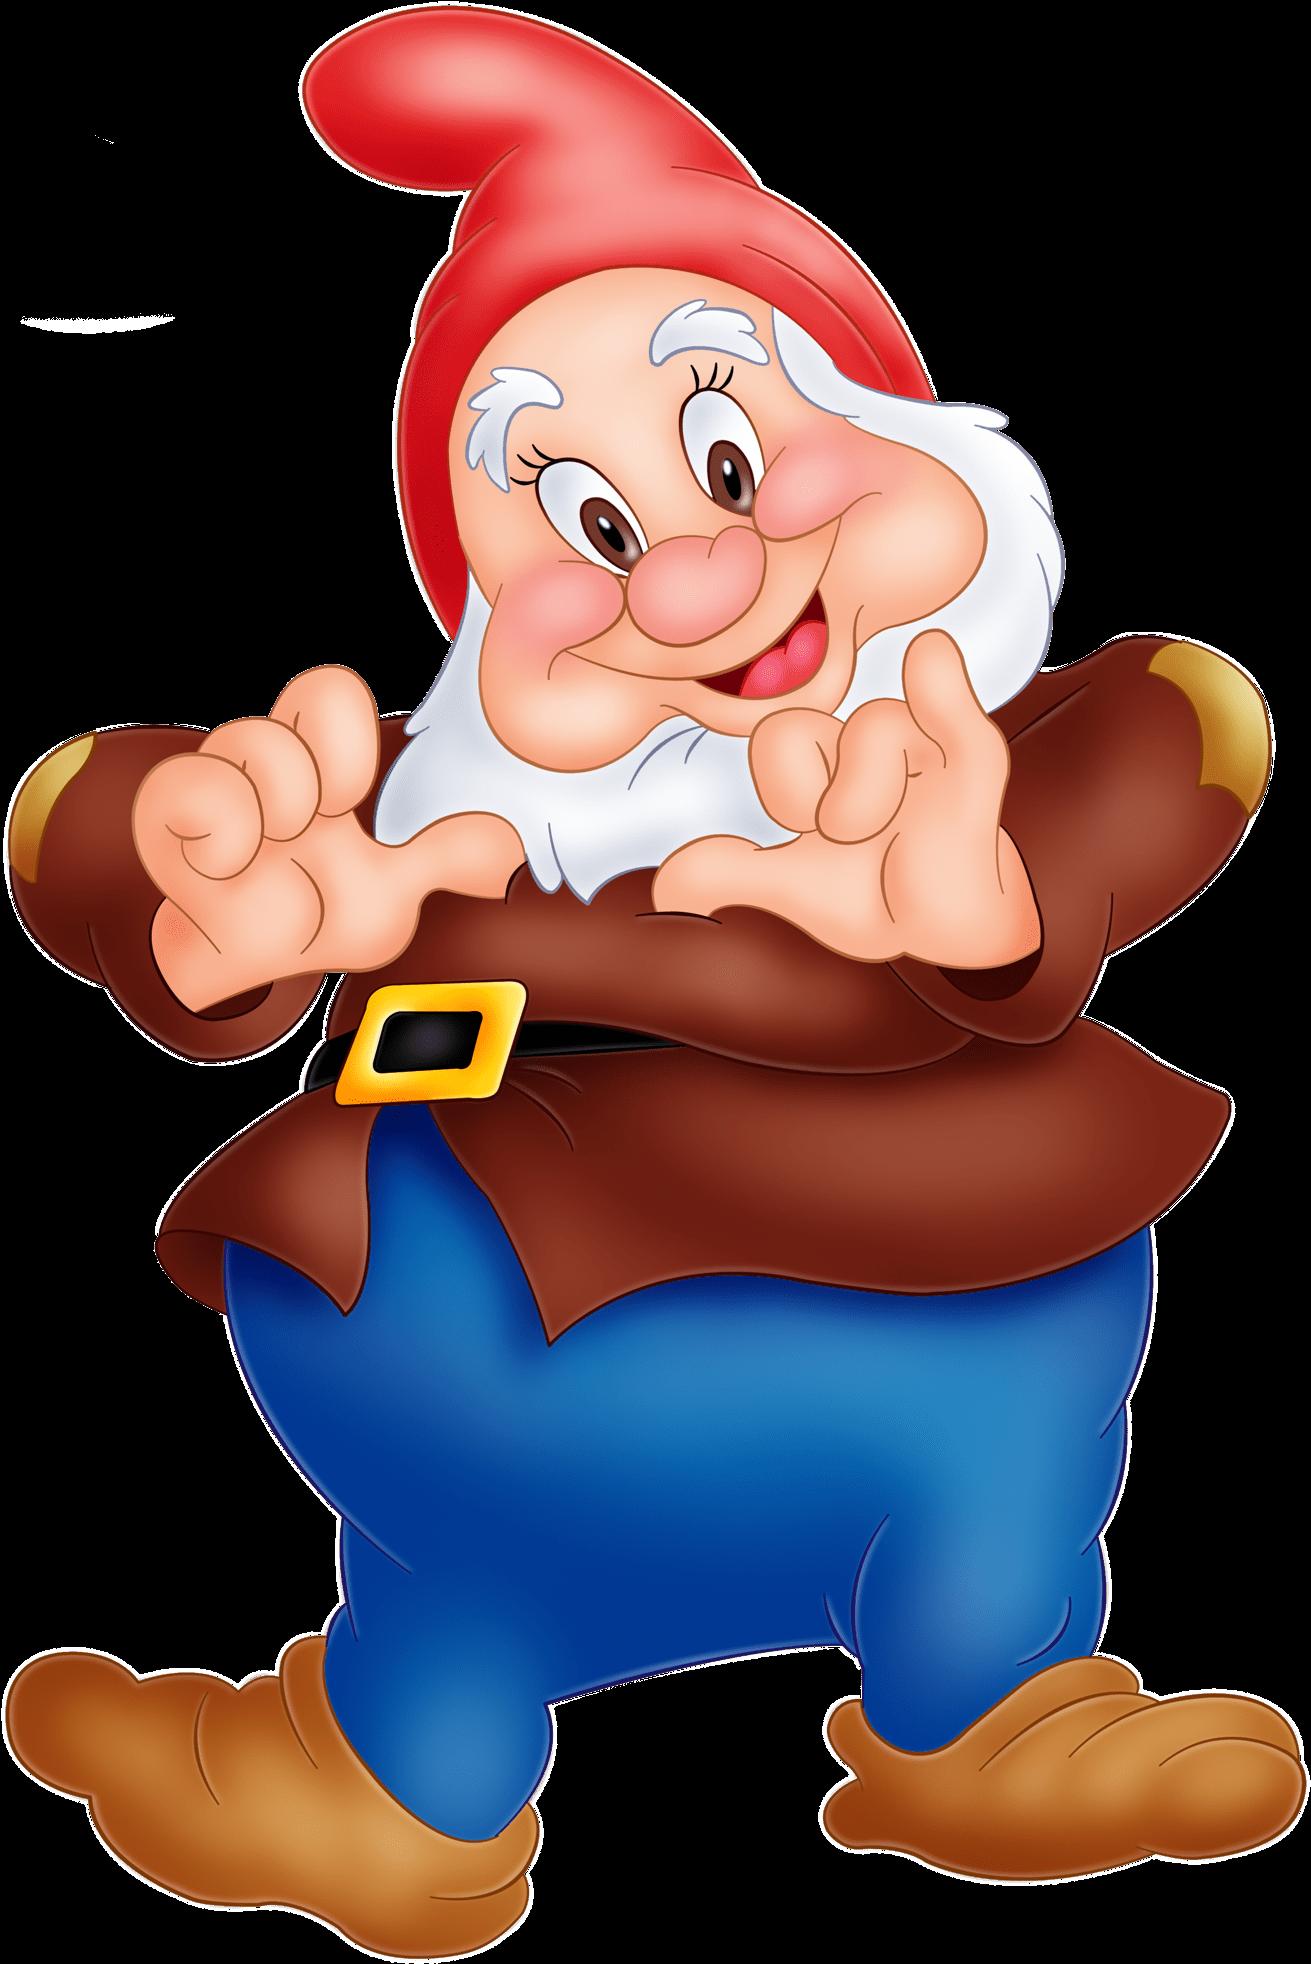 Albă Ca Zăpada Fericit Pitic Albă Ca Zăpada Pitici Png Transparent Png Kindpng Cartoons Png Snow White Dwarfs Snow White